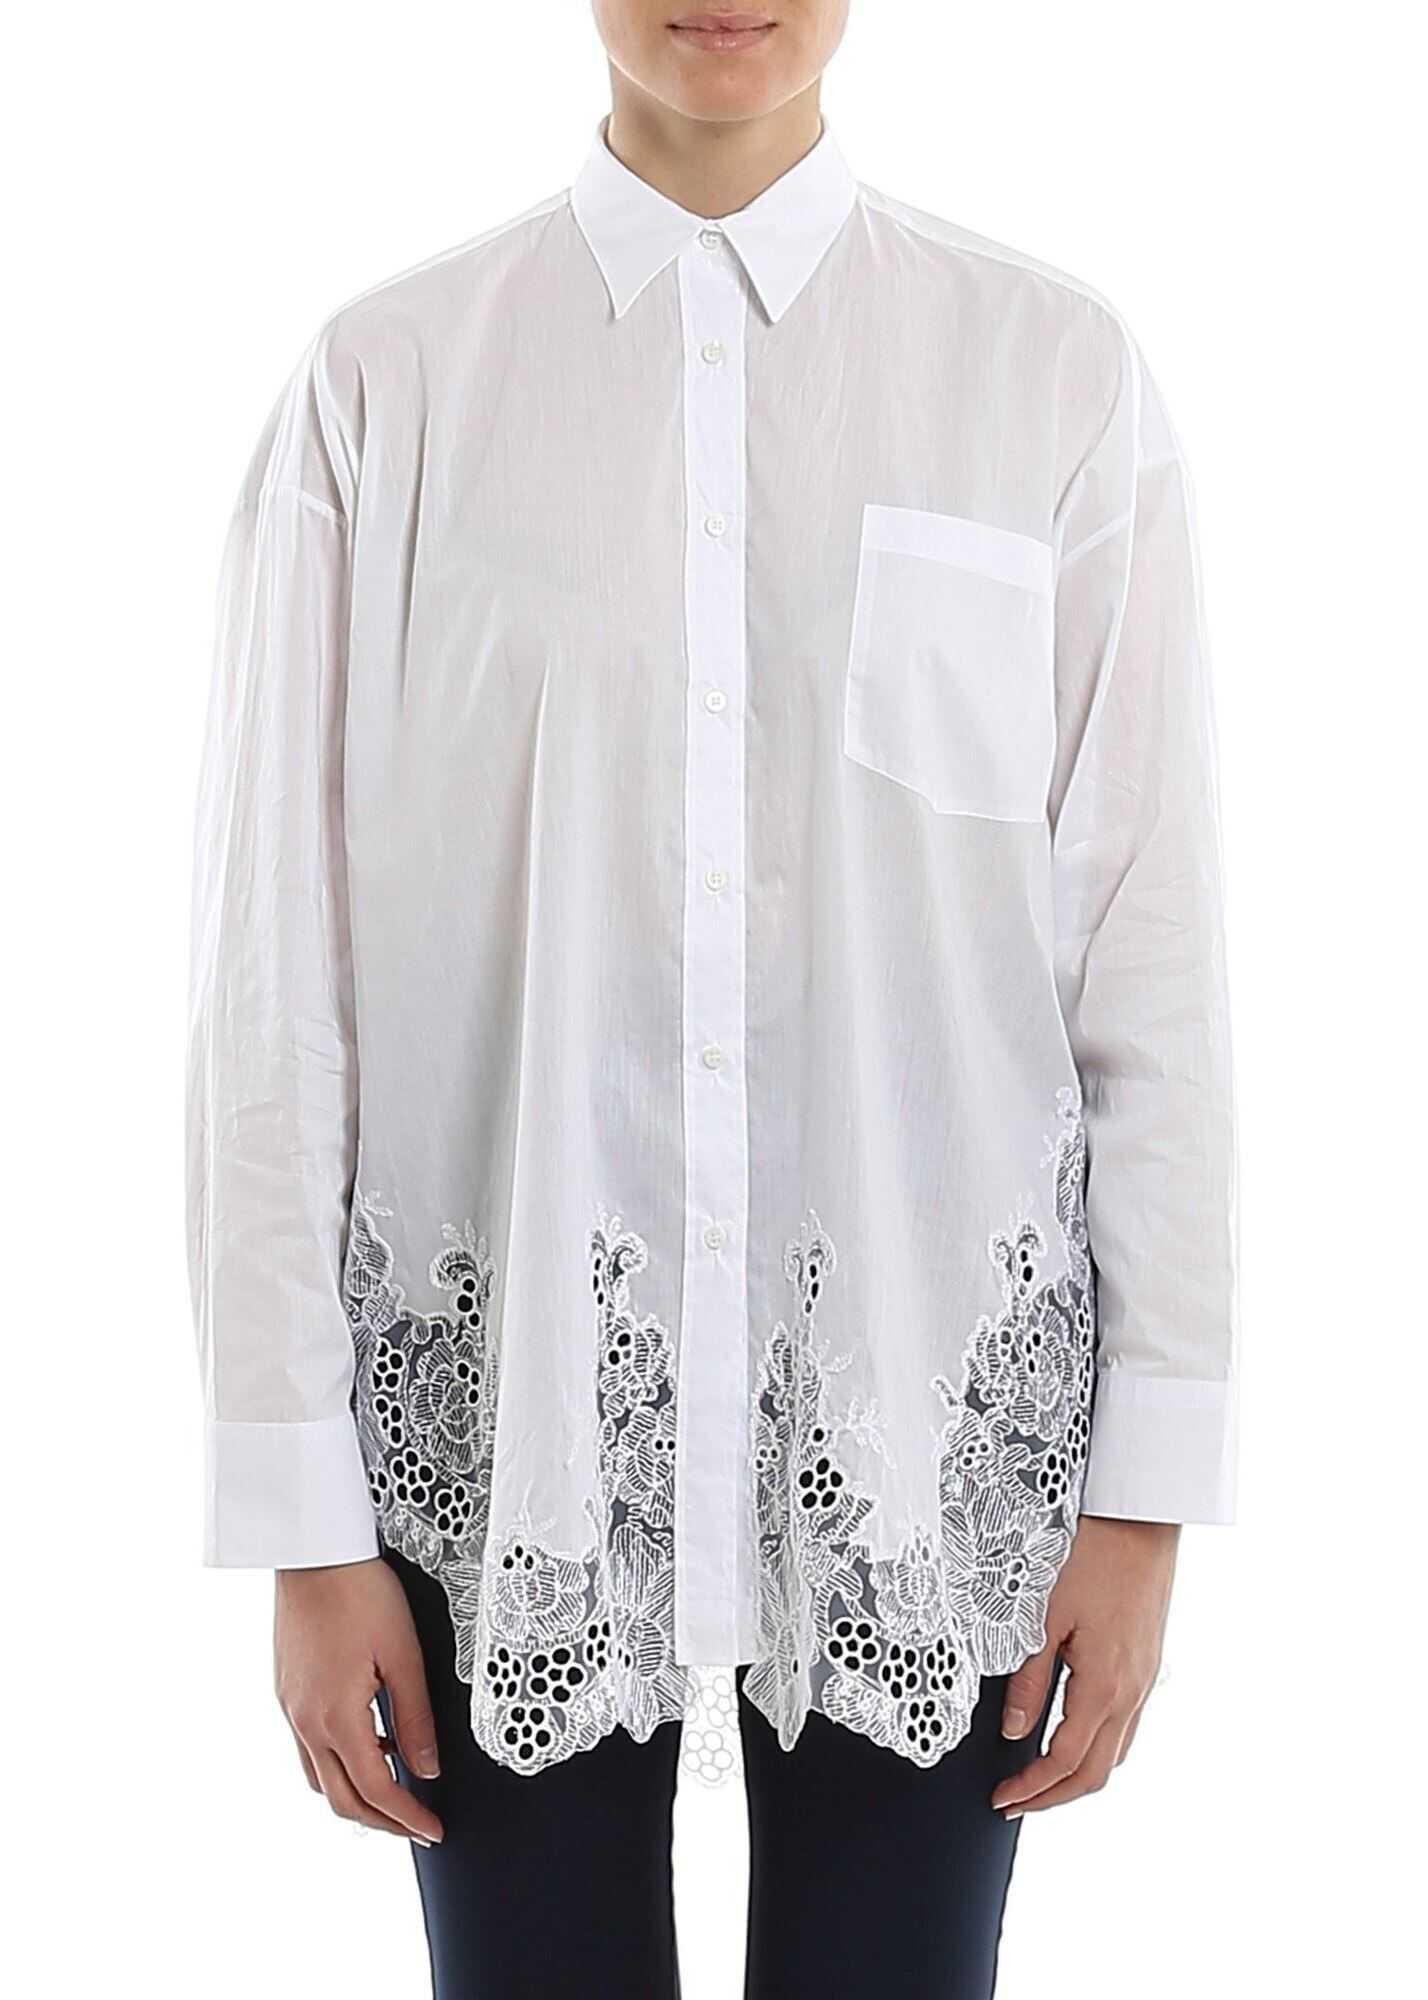 Ermanno Scervino Poplin Cotton Lace Hem Shirt White